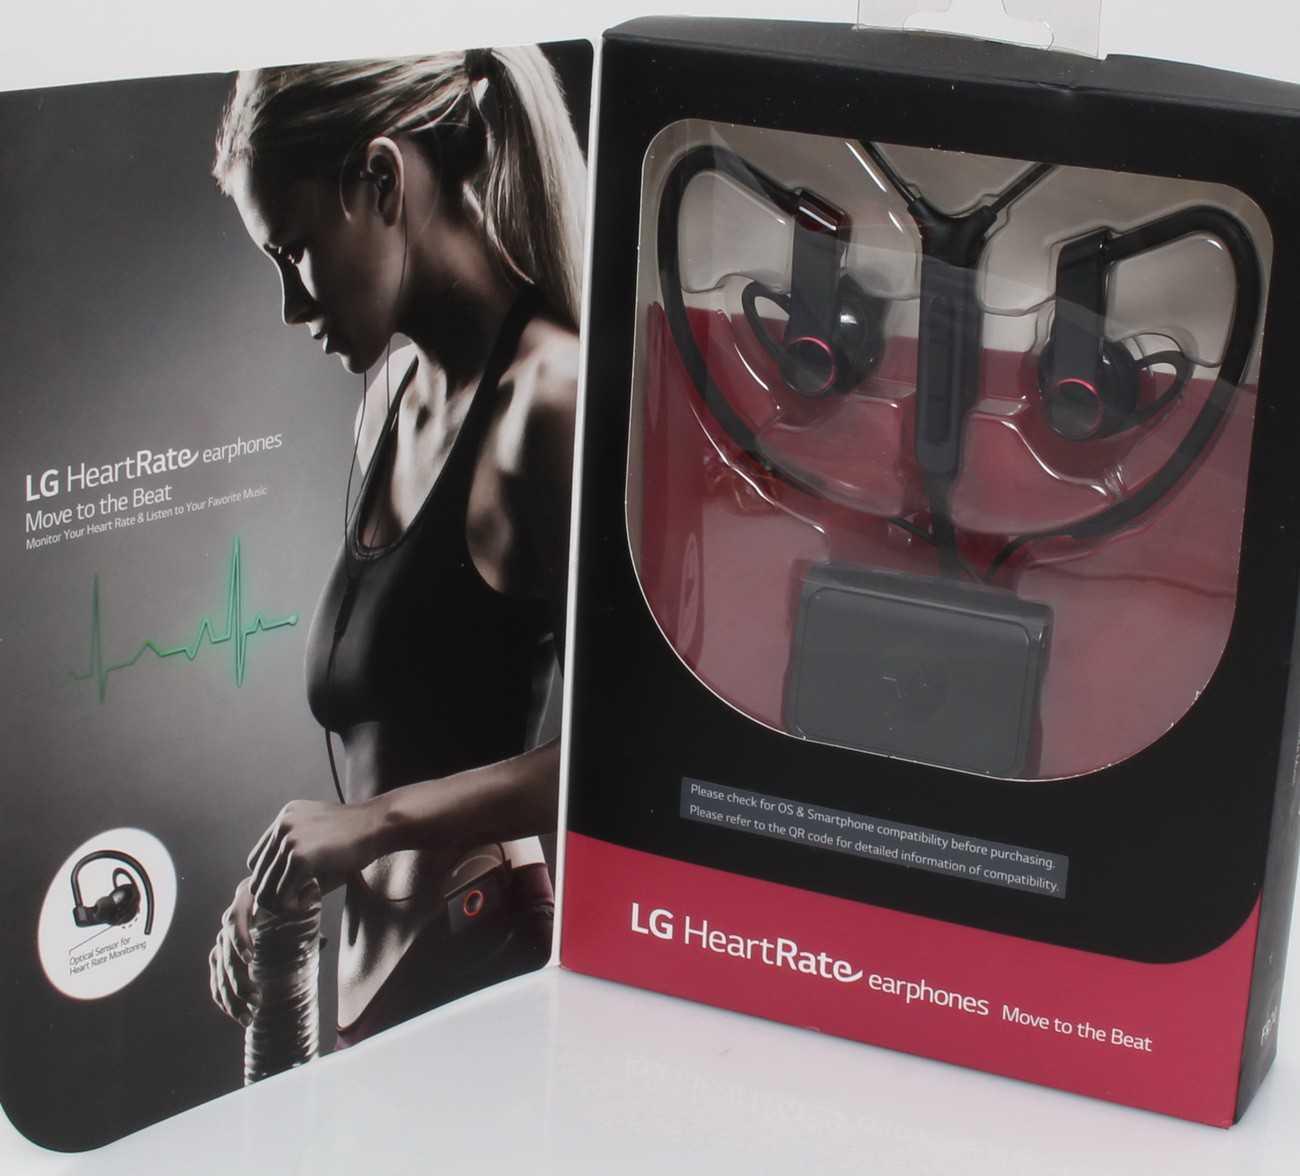 LG FR74 Heart Rate Monitor Earphones